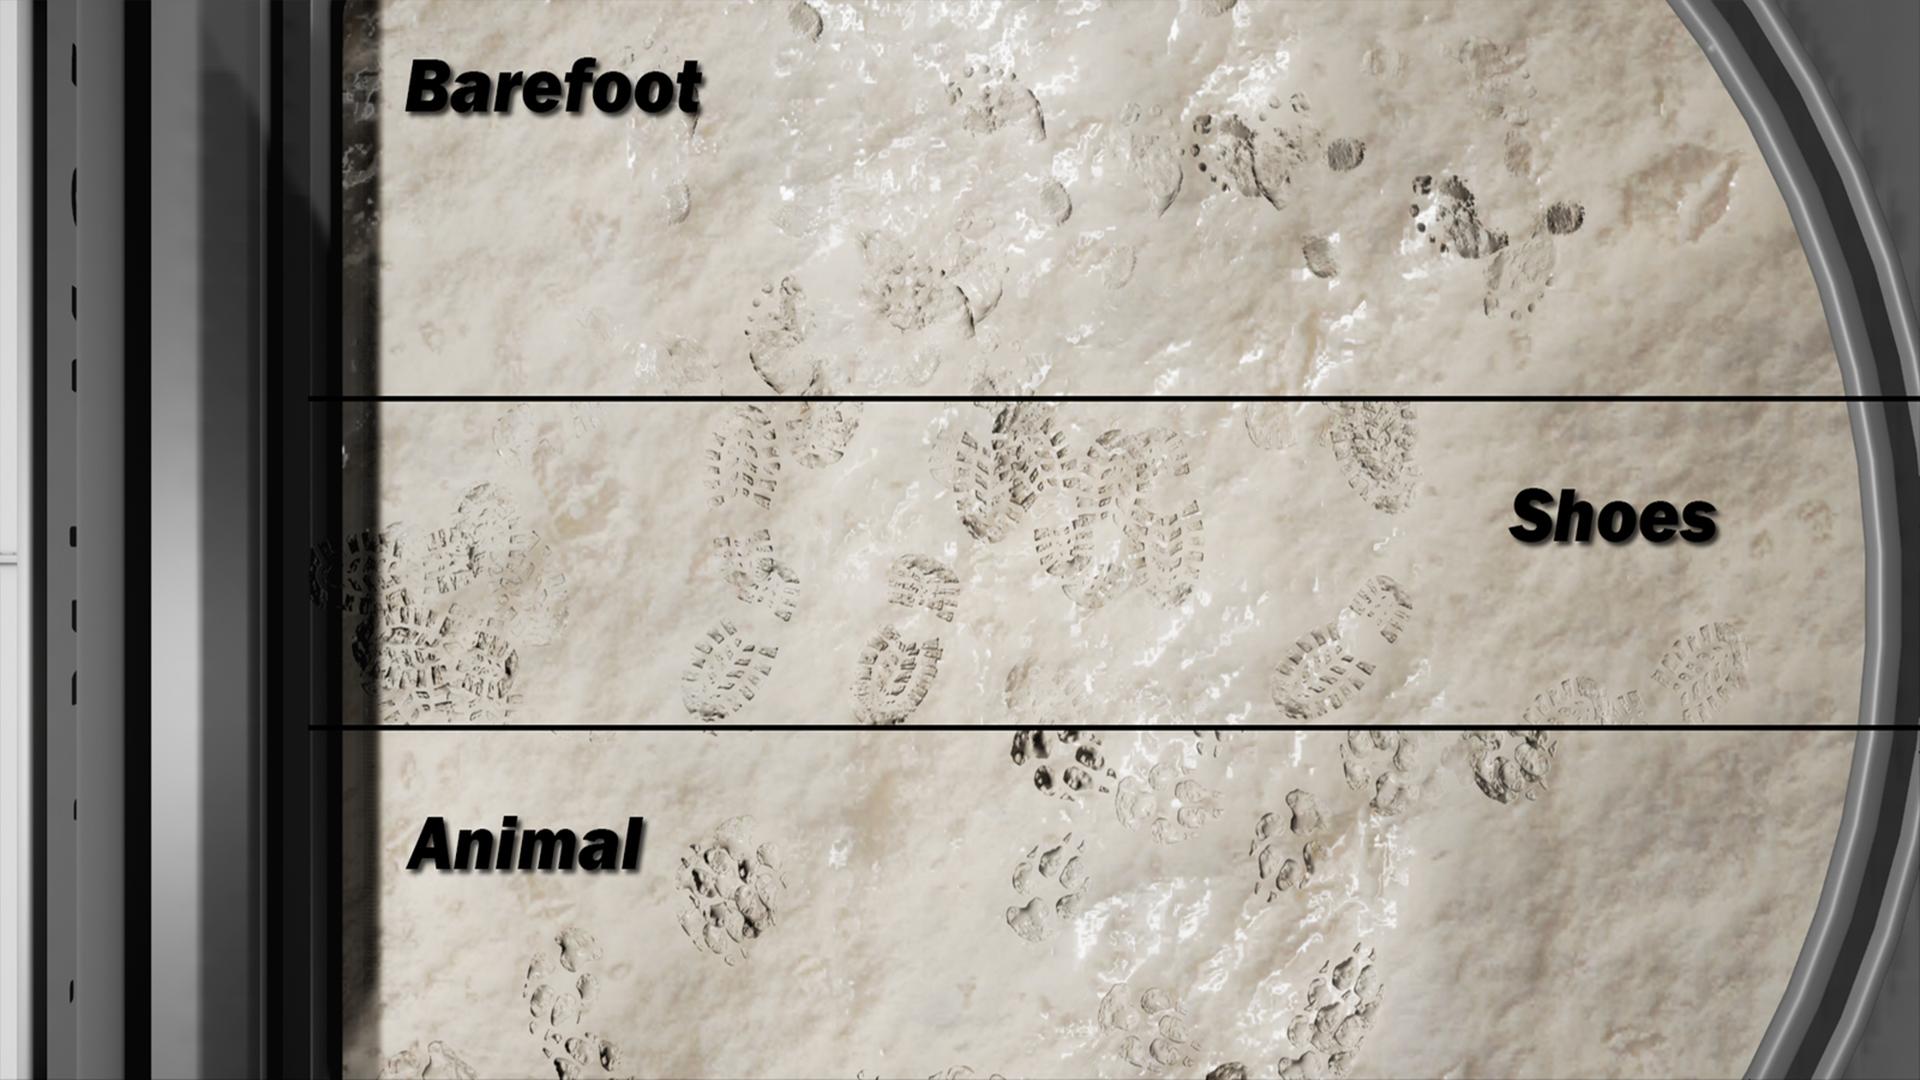 Footprint System (Jonas Richartz)